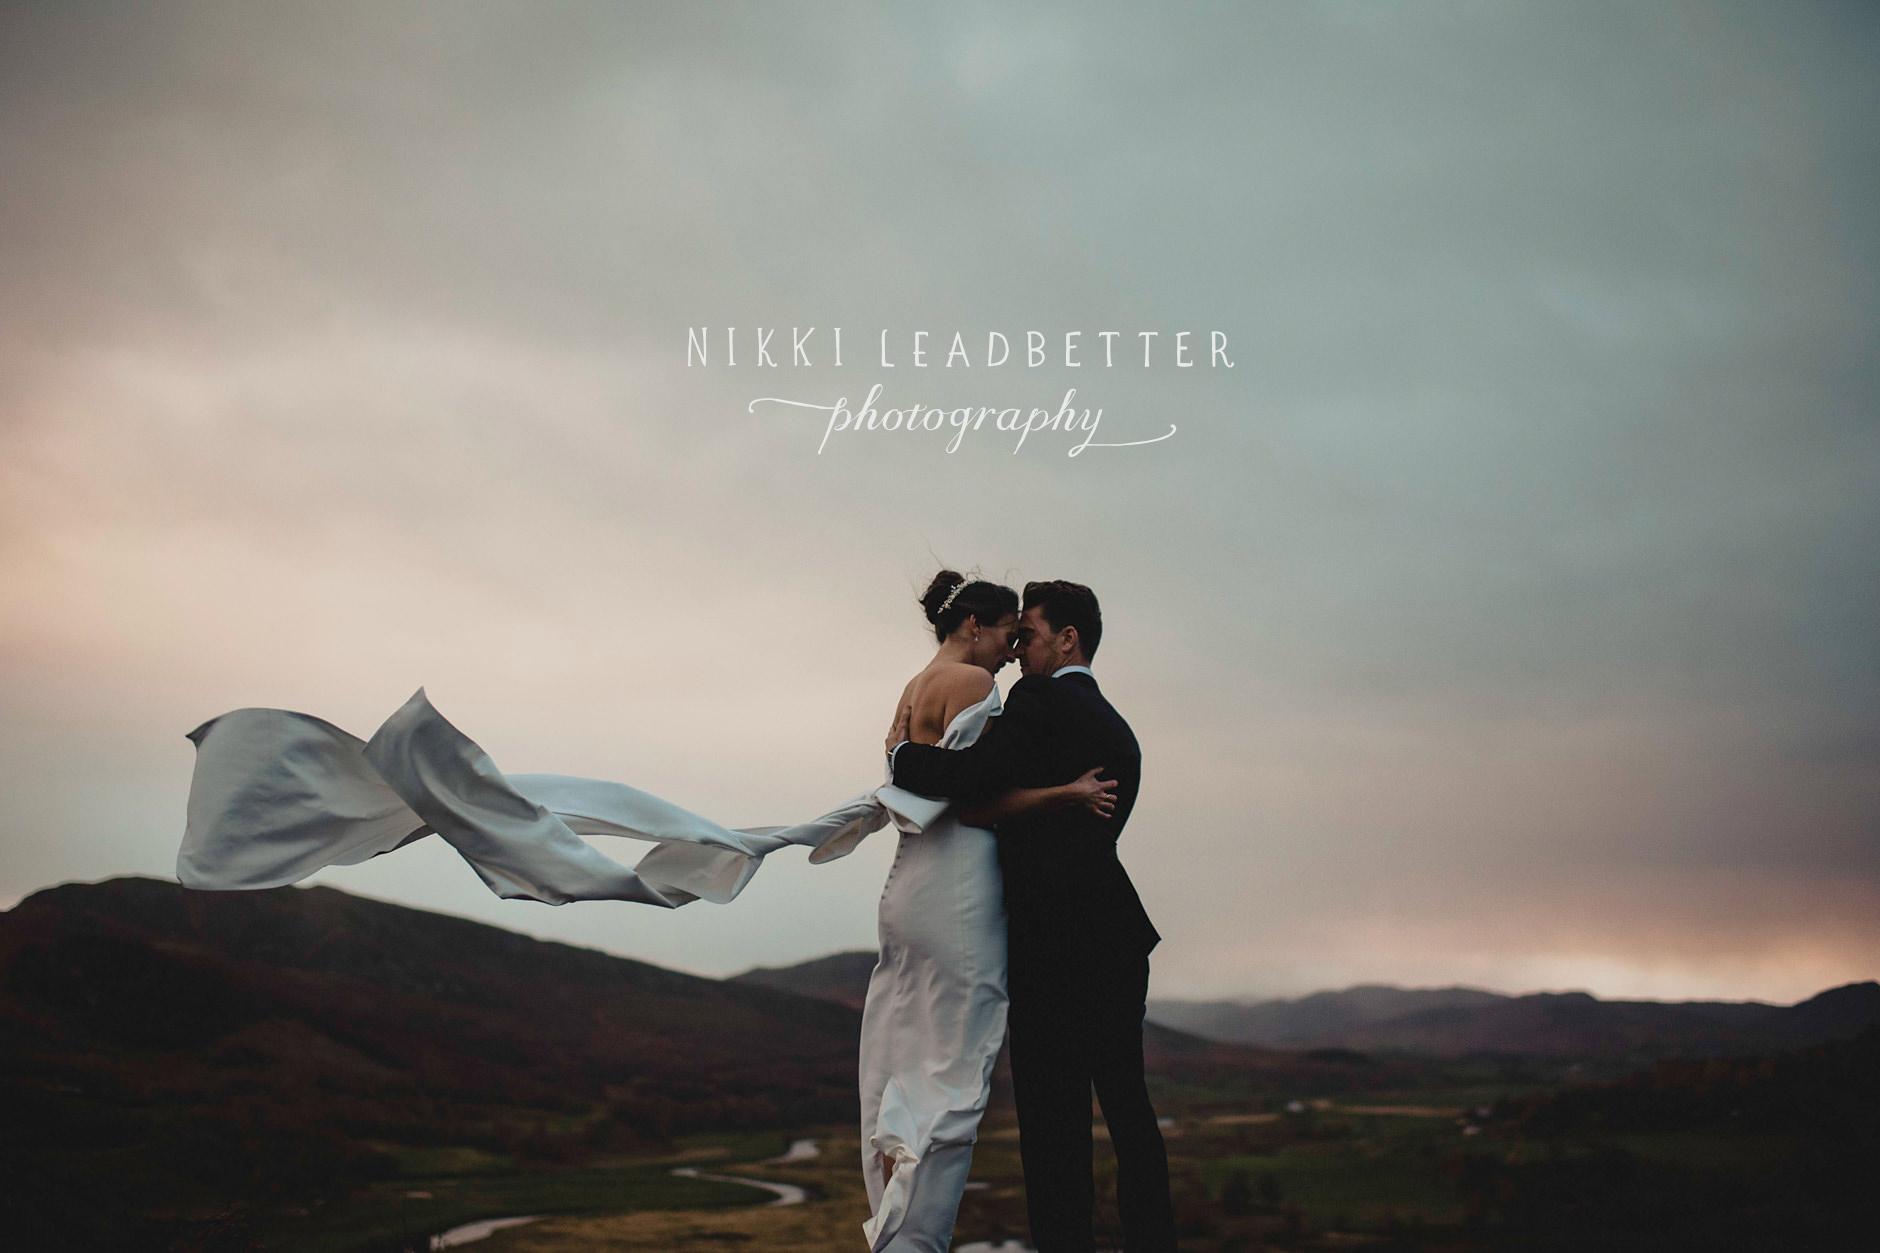 Alternative_wedding_photographer_scotland_nikki_leadbetter-905 copy.jpg